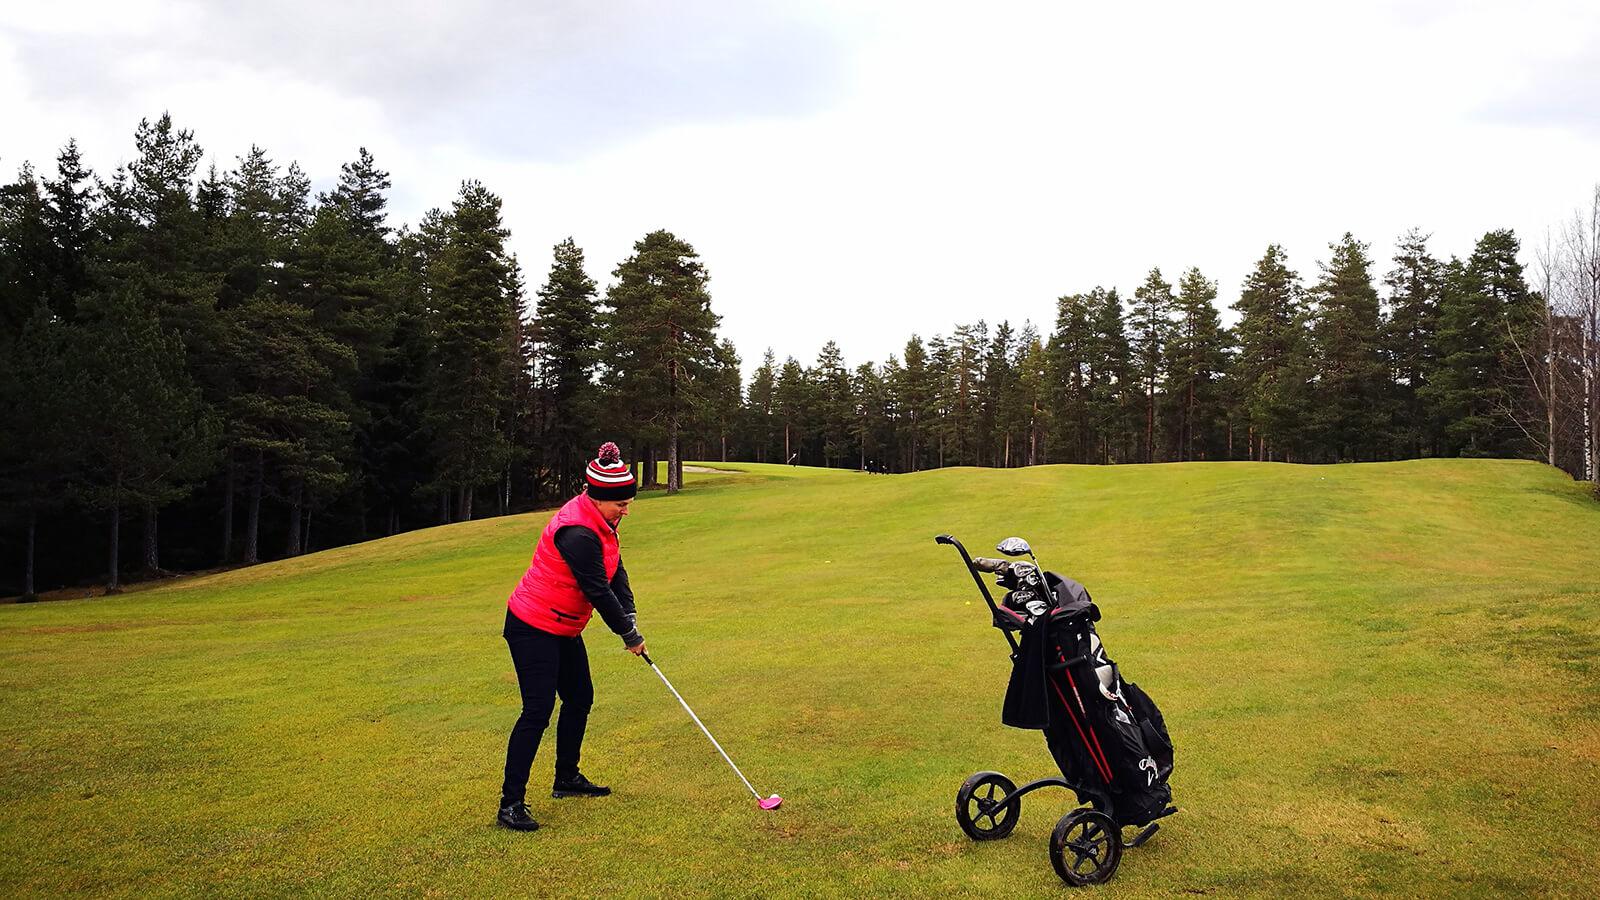 Innspill på hull 9, Kjekstad Golfklubb